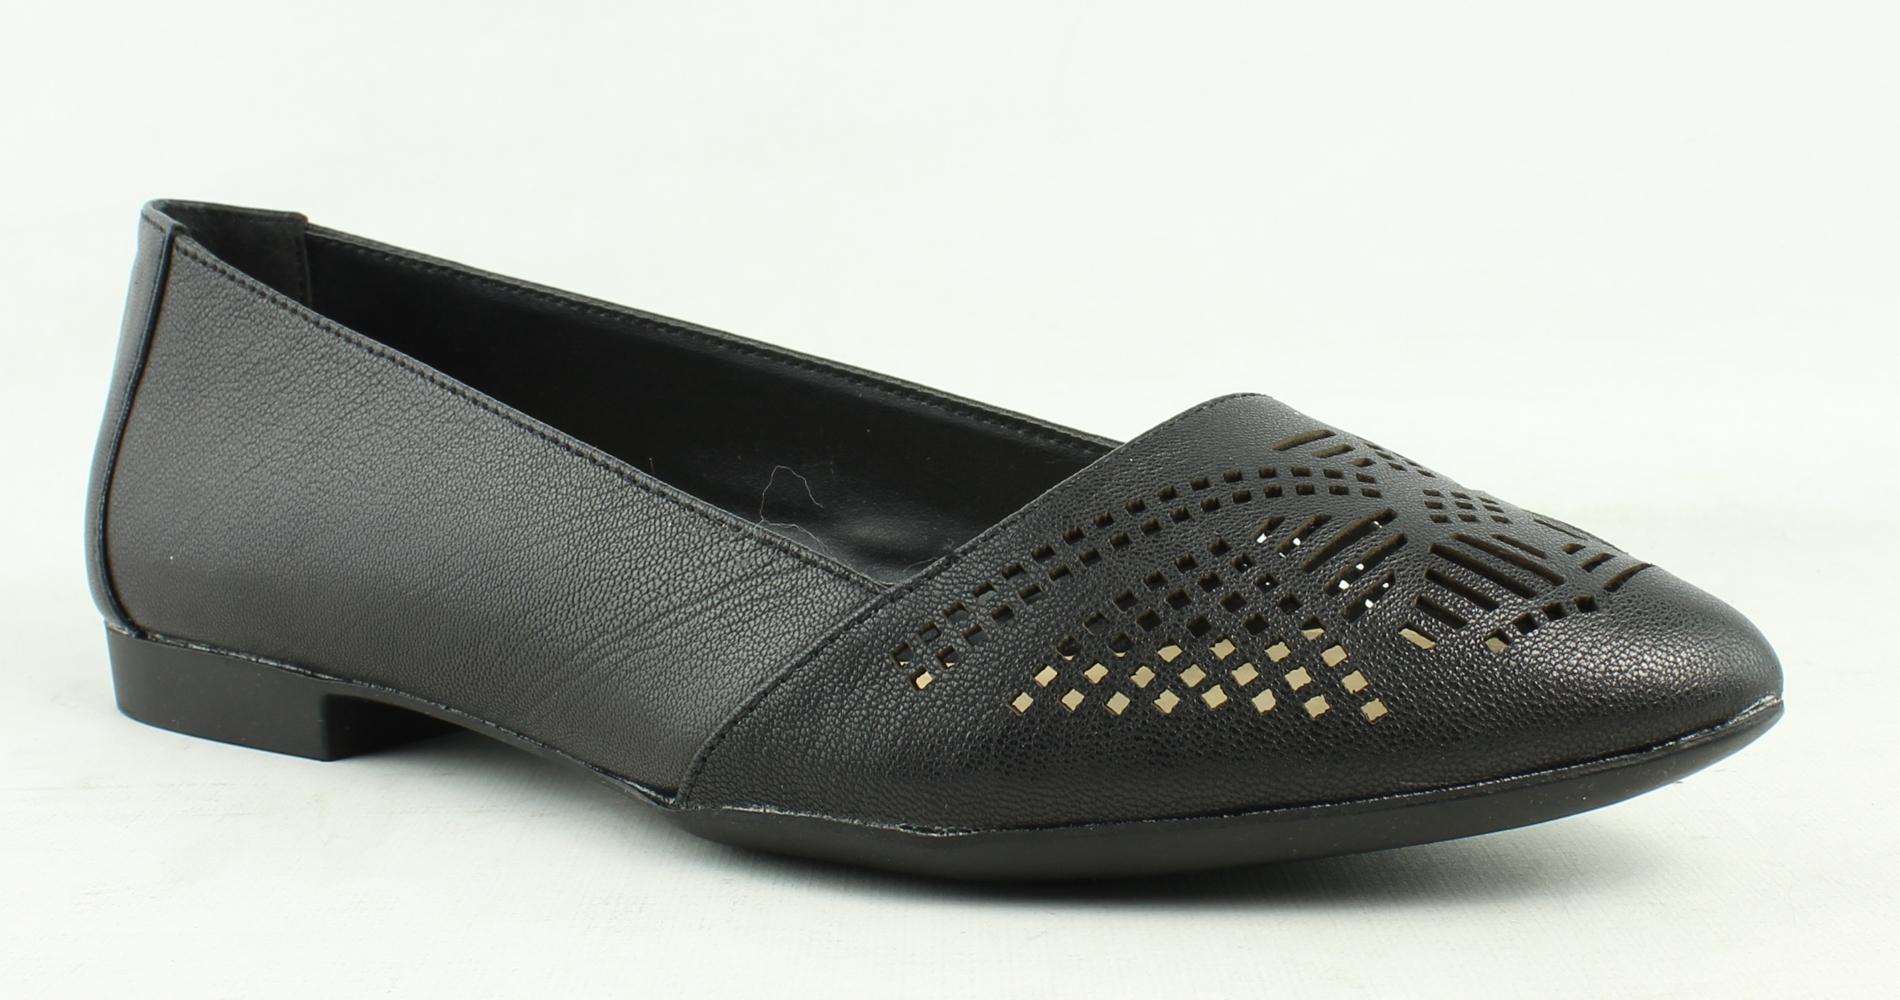 Bella Vita Womens Black Loafer Flats Size 6 New by Bella Vita